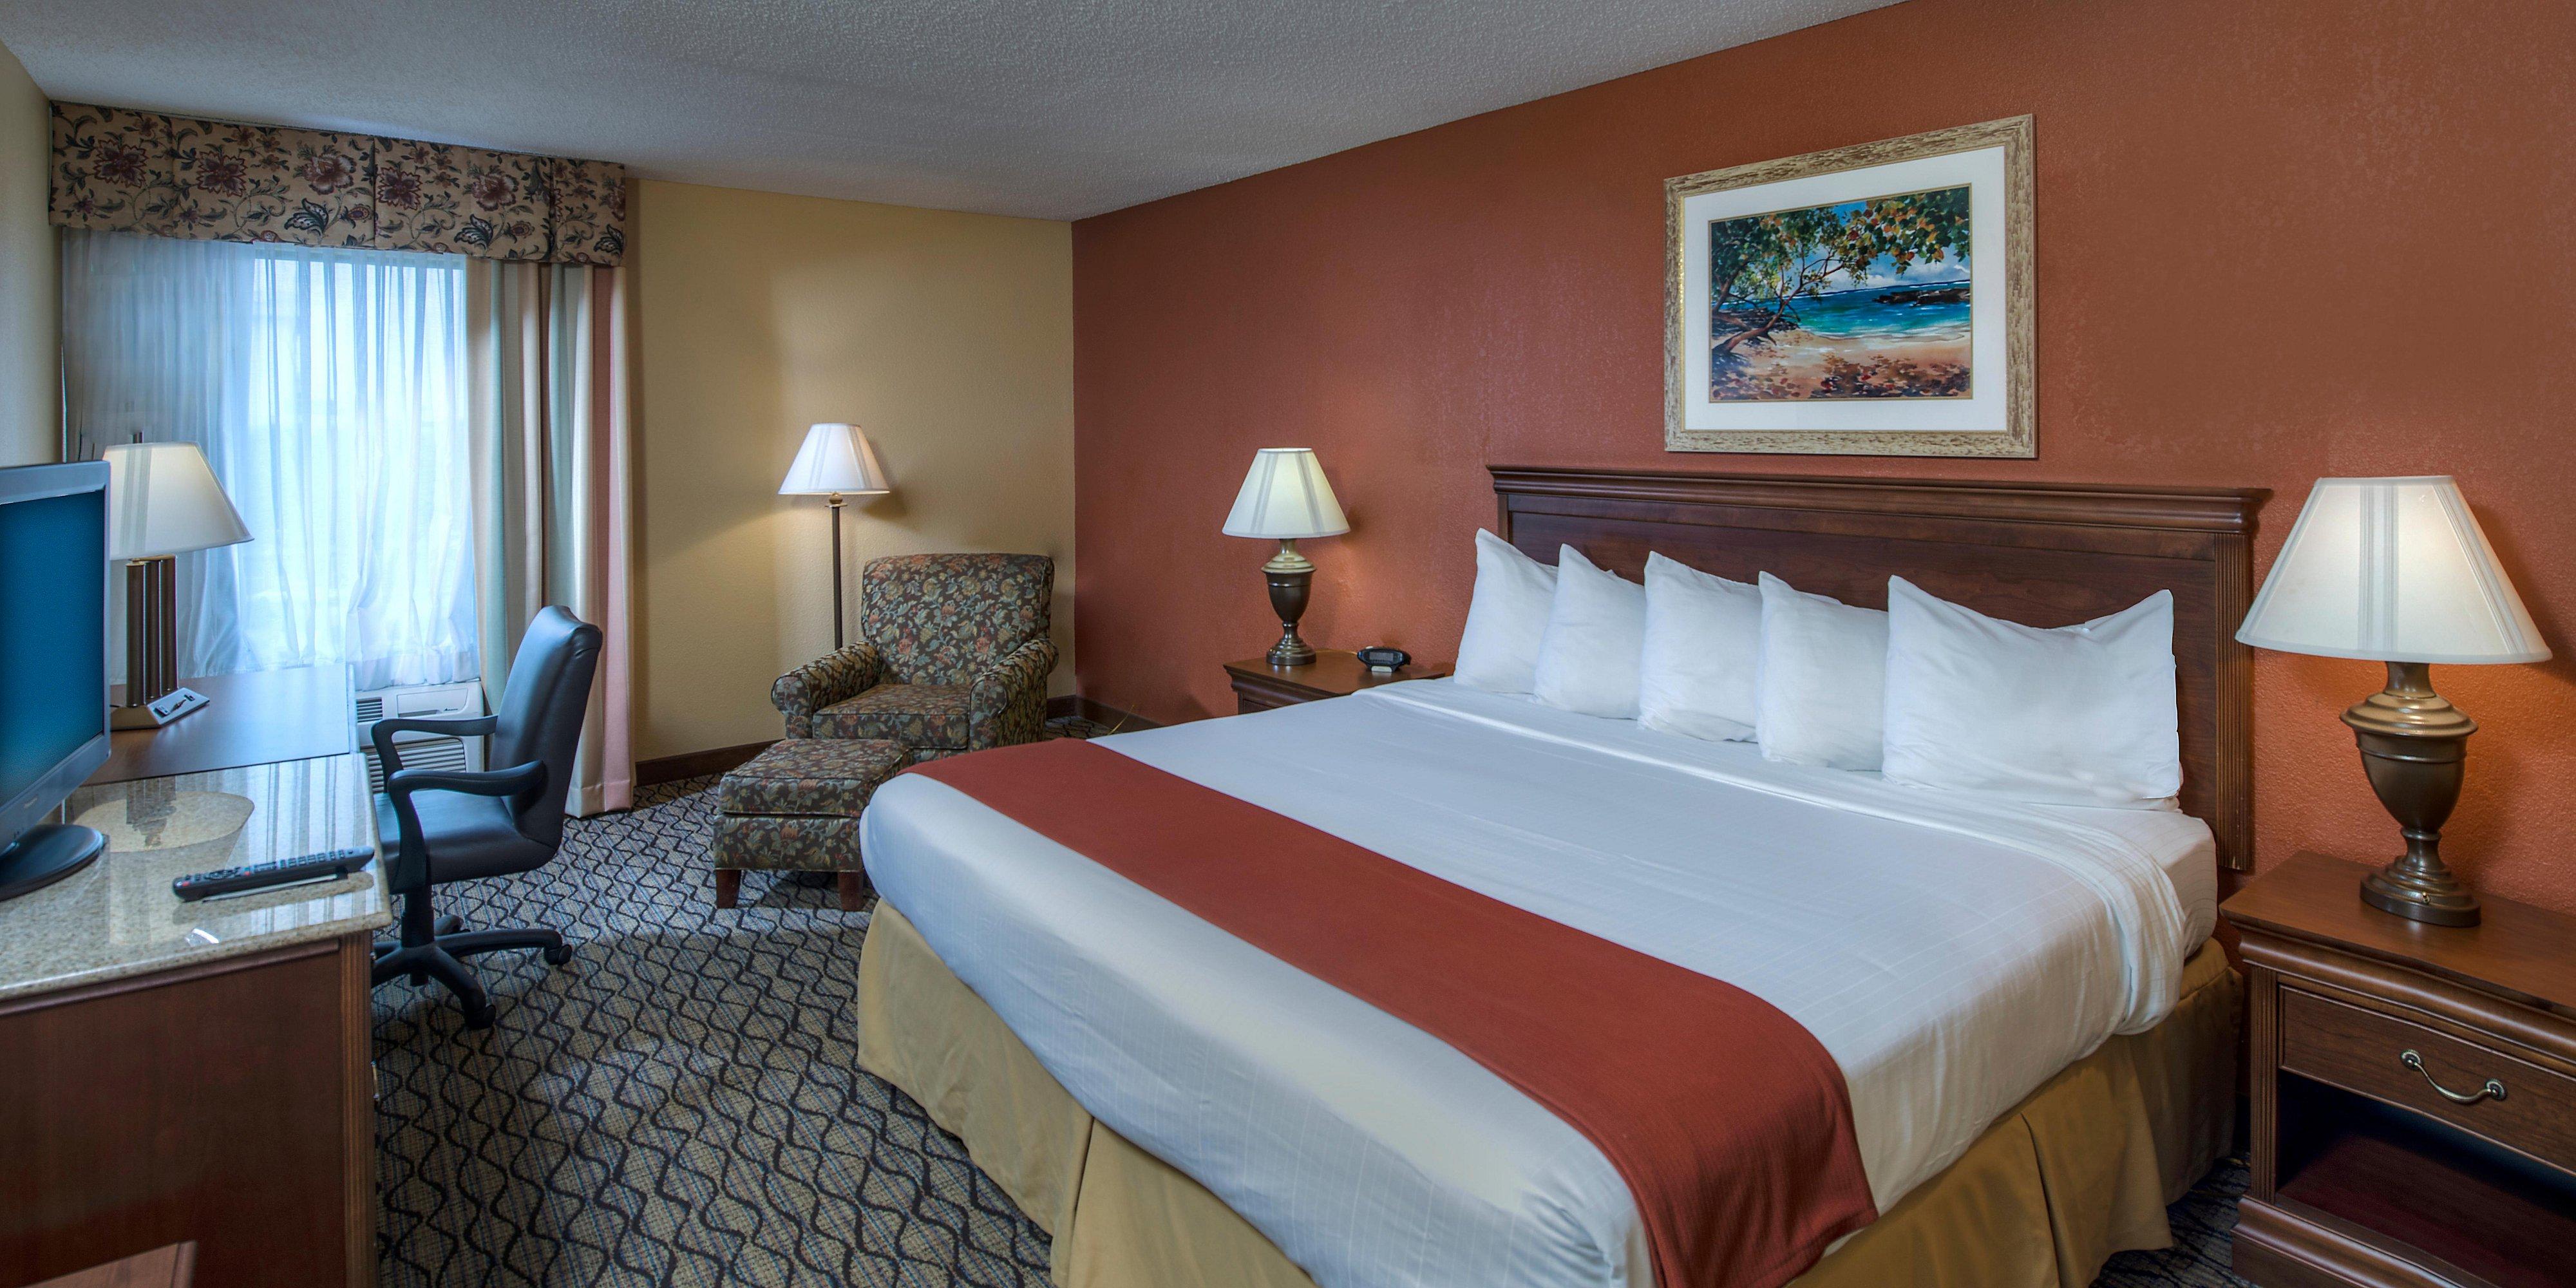 Holiday Inn Express Miami Springs 4710576060 2x1